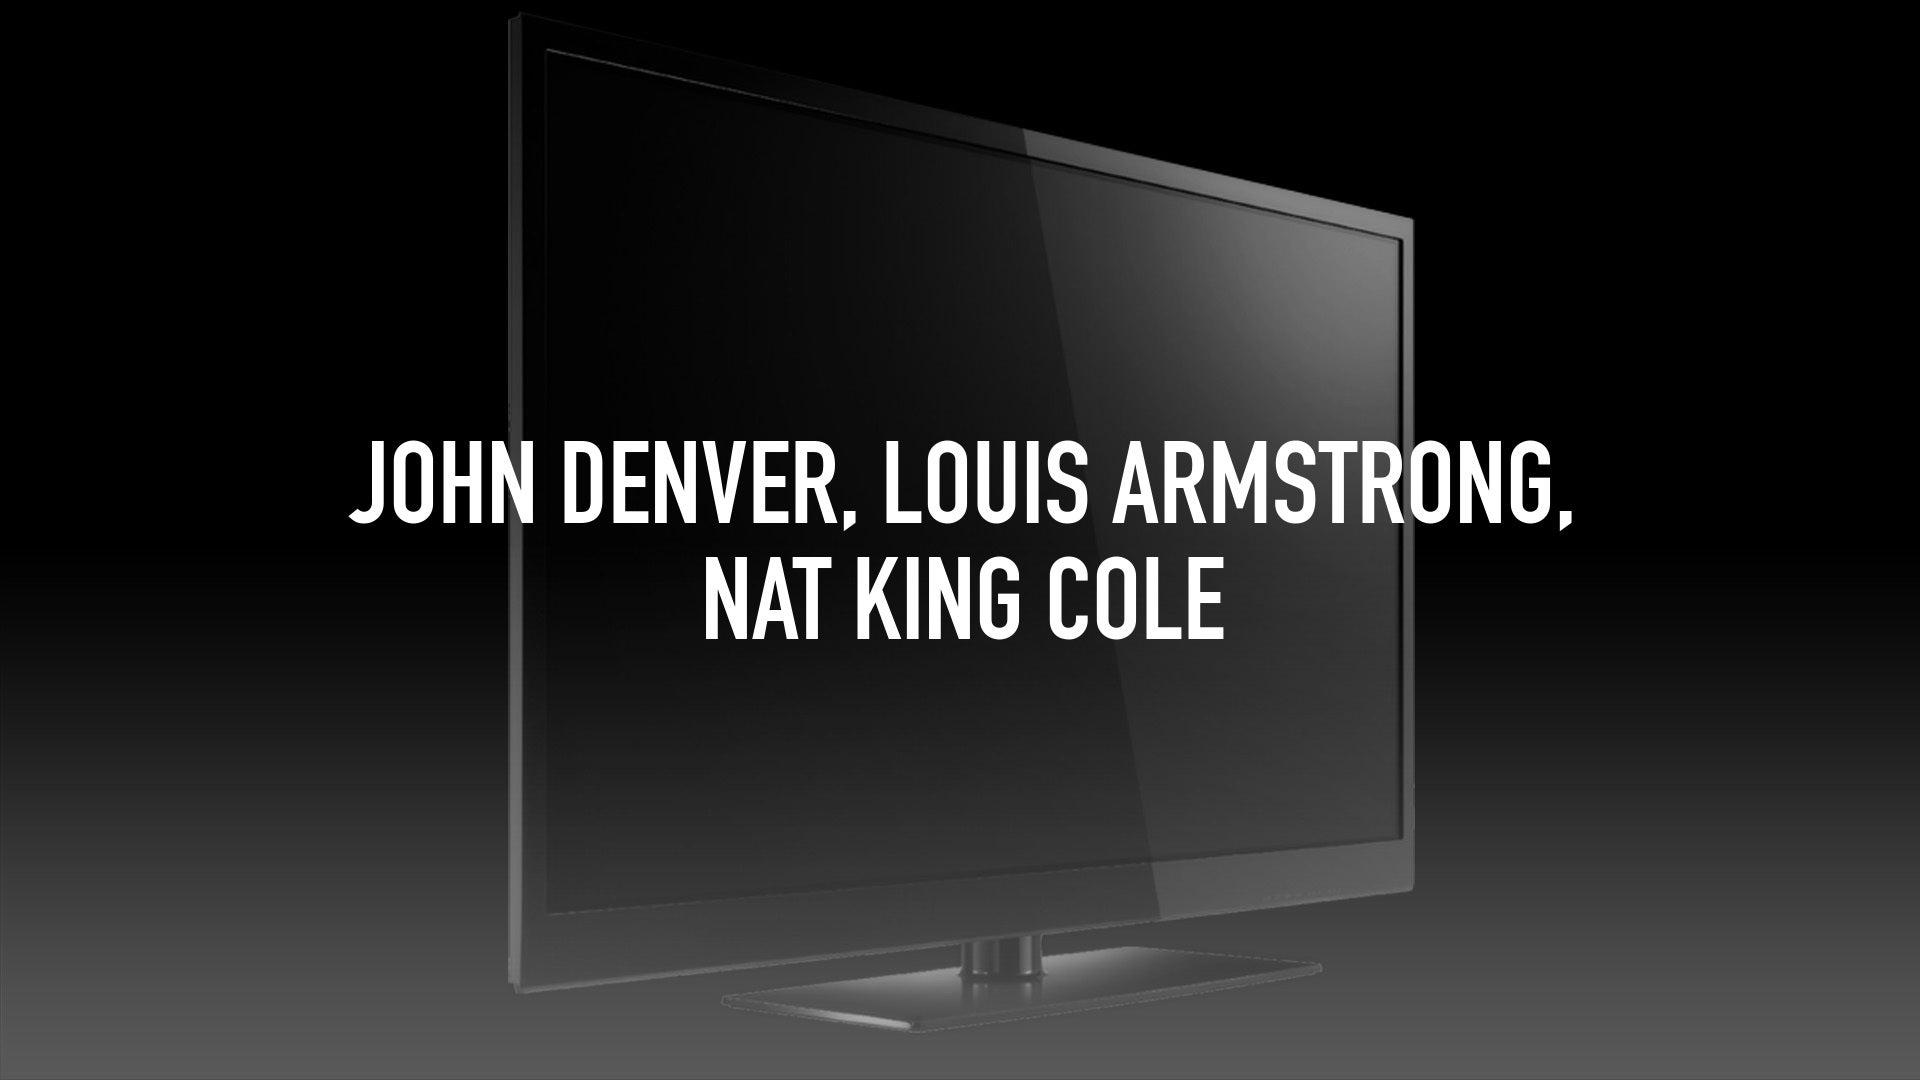 John Denver, Louis Armstrong, Nat King Cole